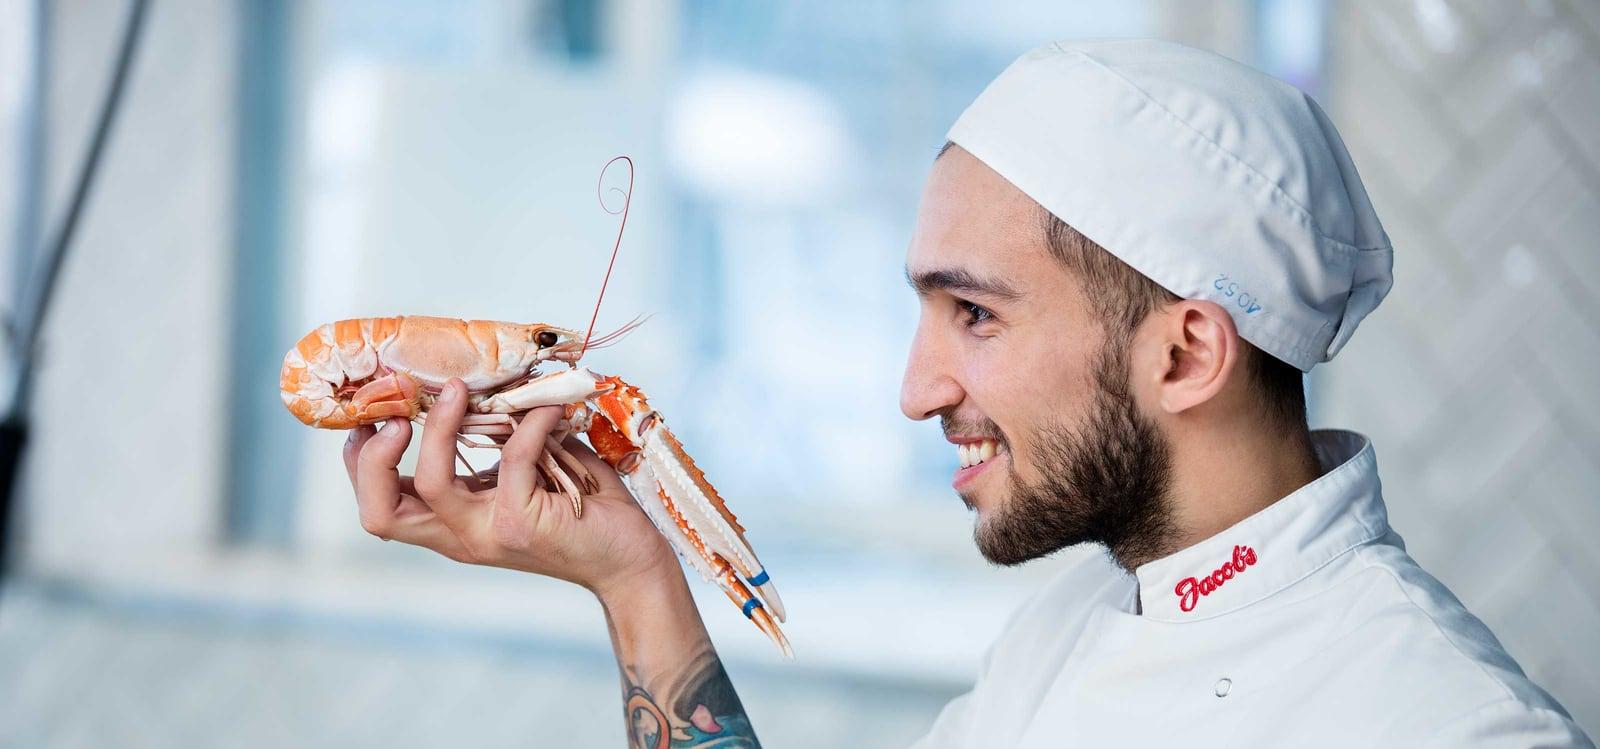 Kokk som holder en hummer mens han ser på den